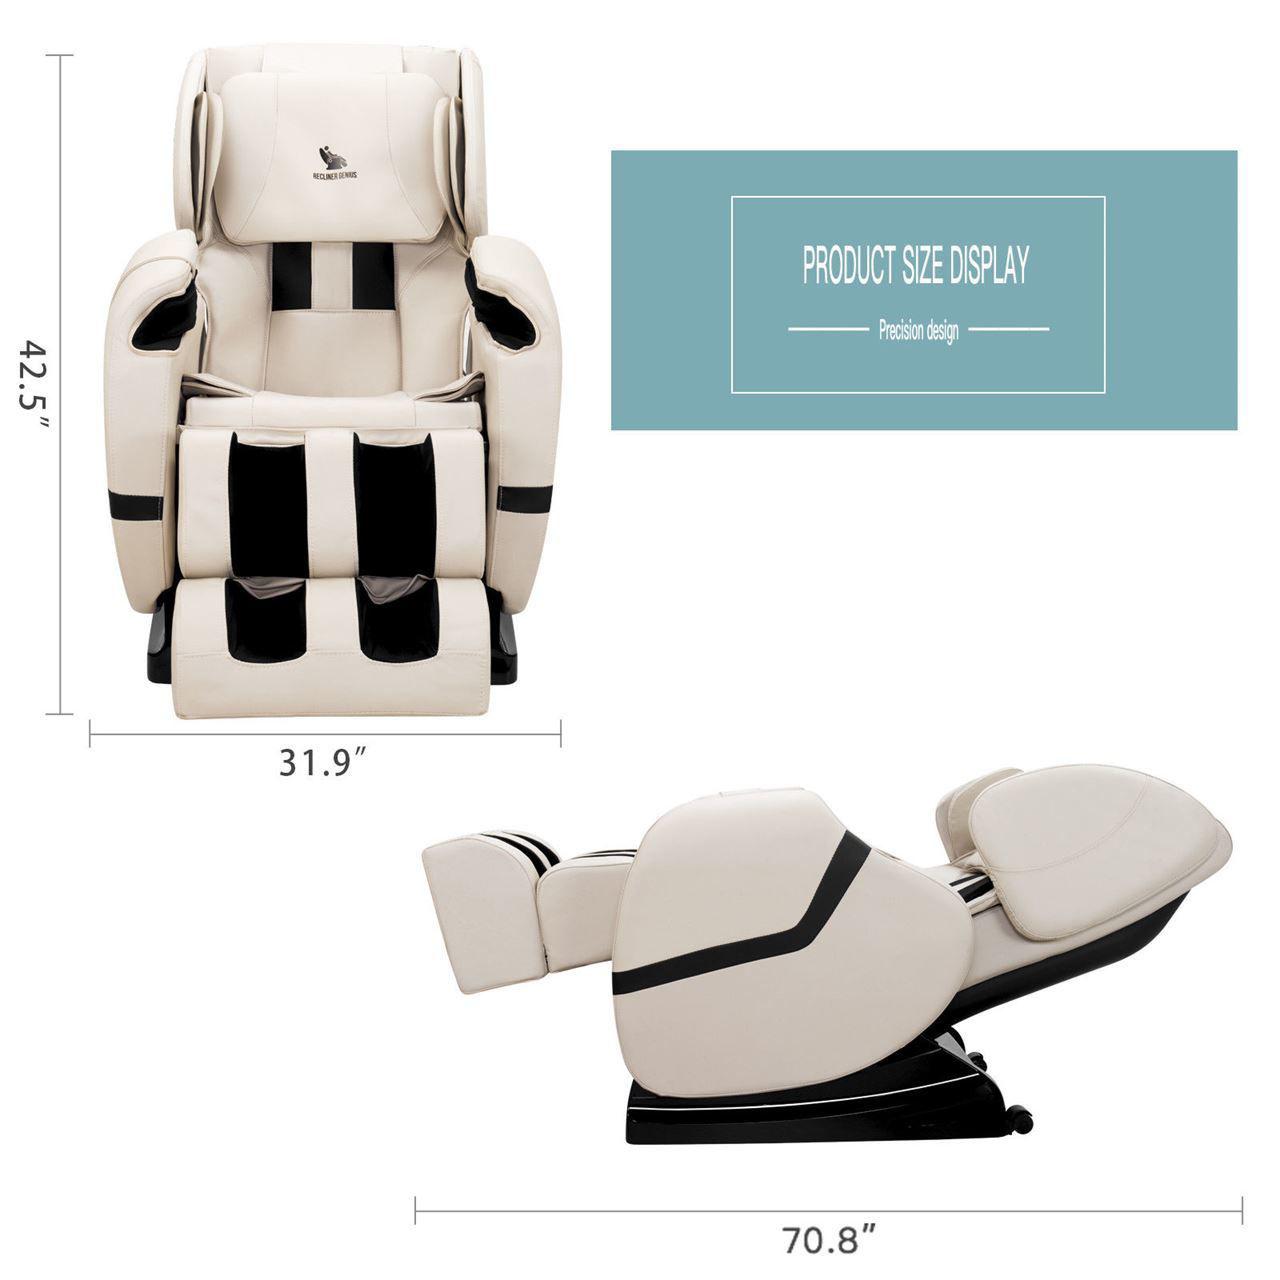 Picture of Zero Gravity Shiatsu Full Body Massage Chair Recliner with Heat and Foot Rest - Khaki